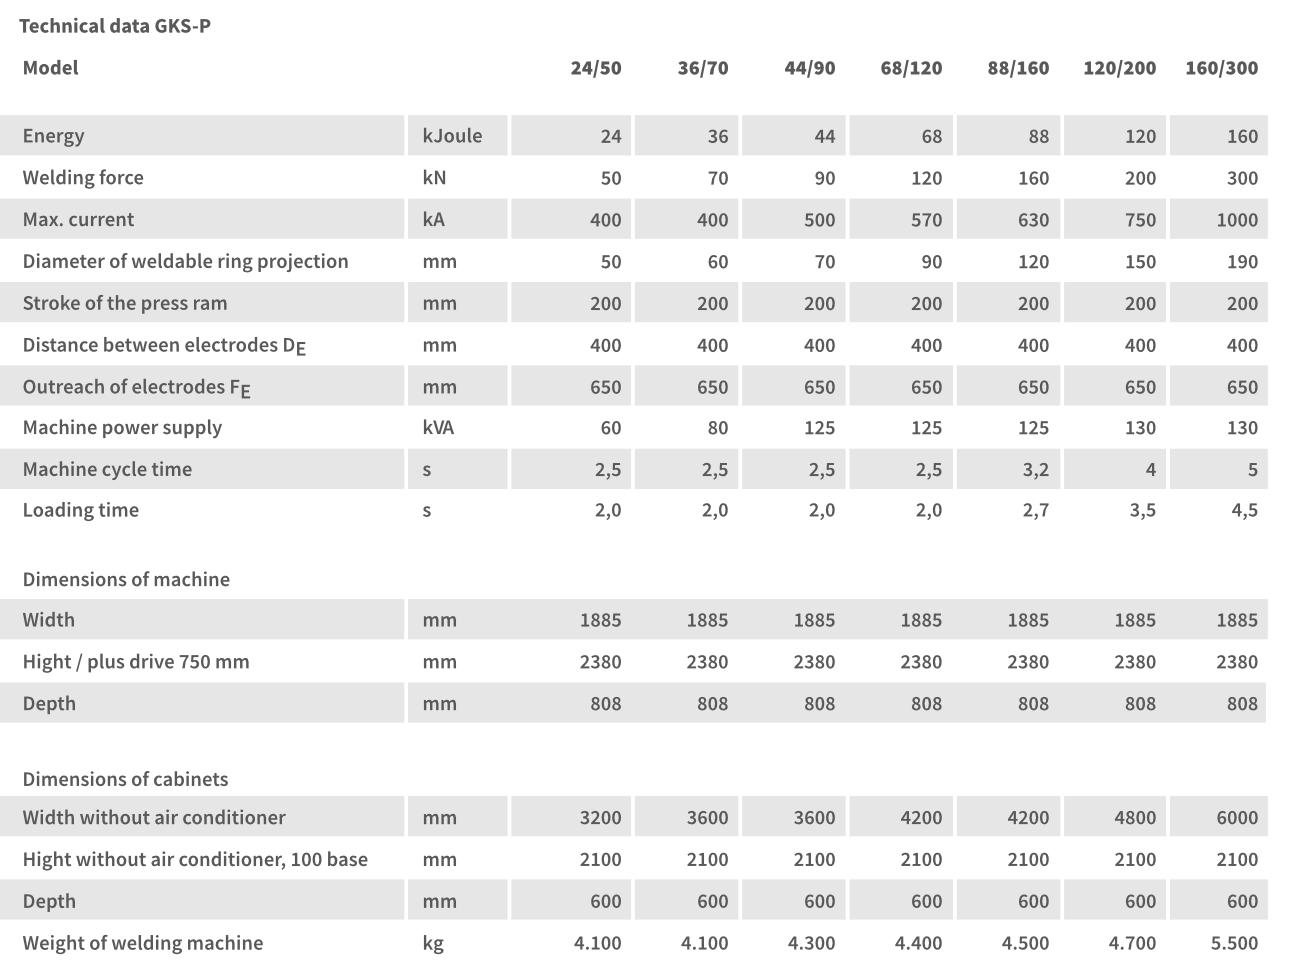 GLAMAtronic GKS-P technical data